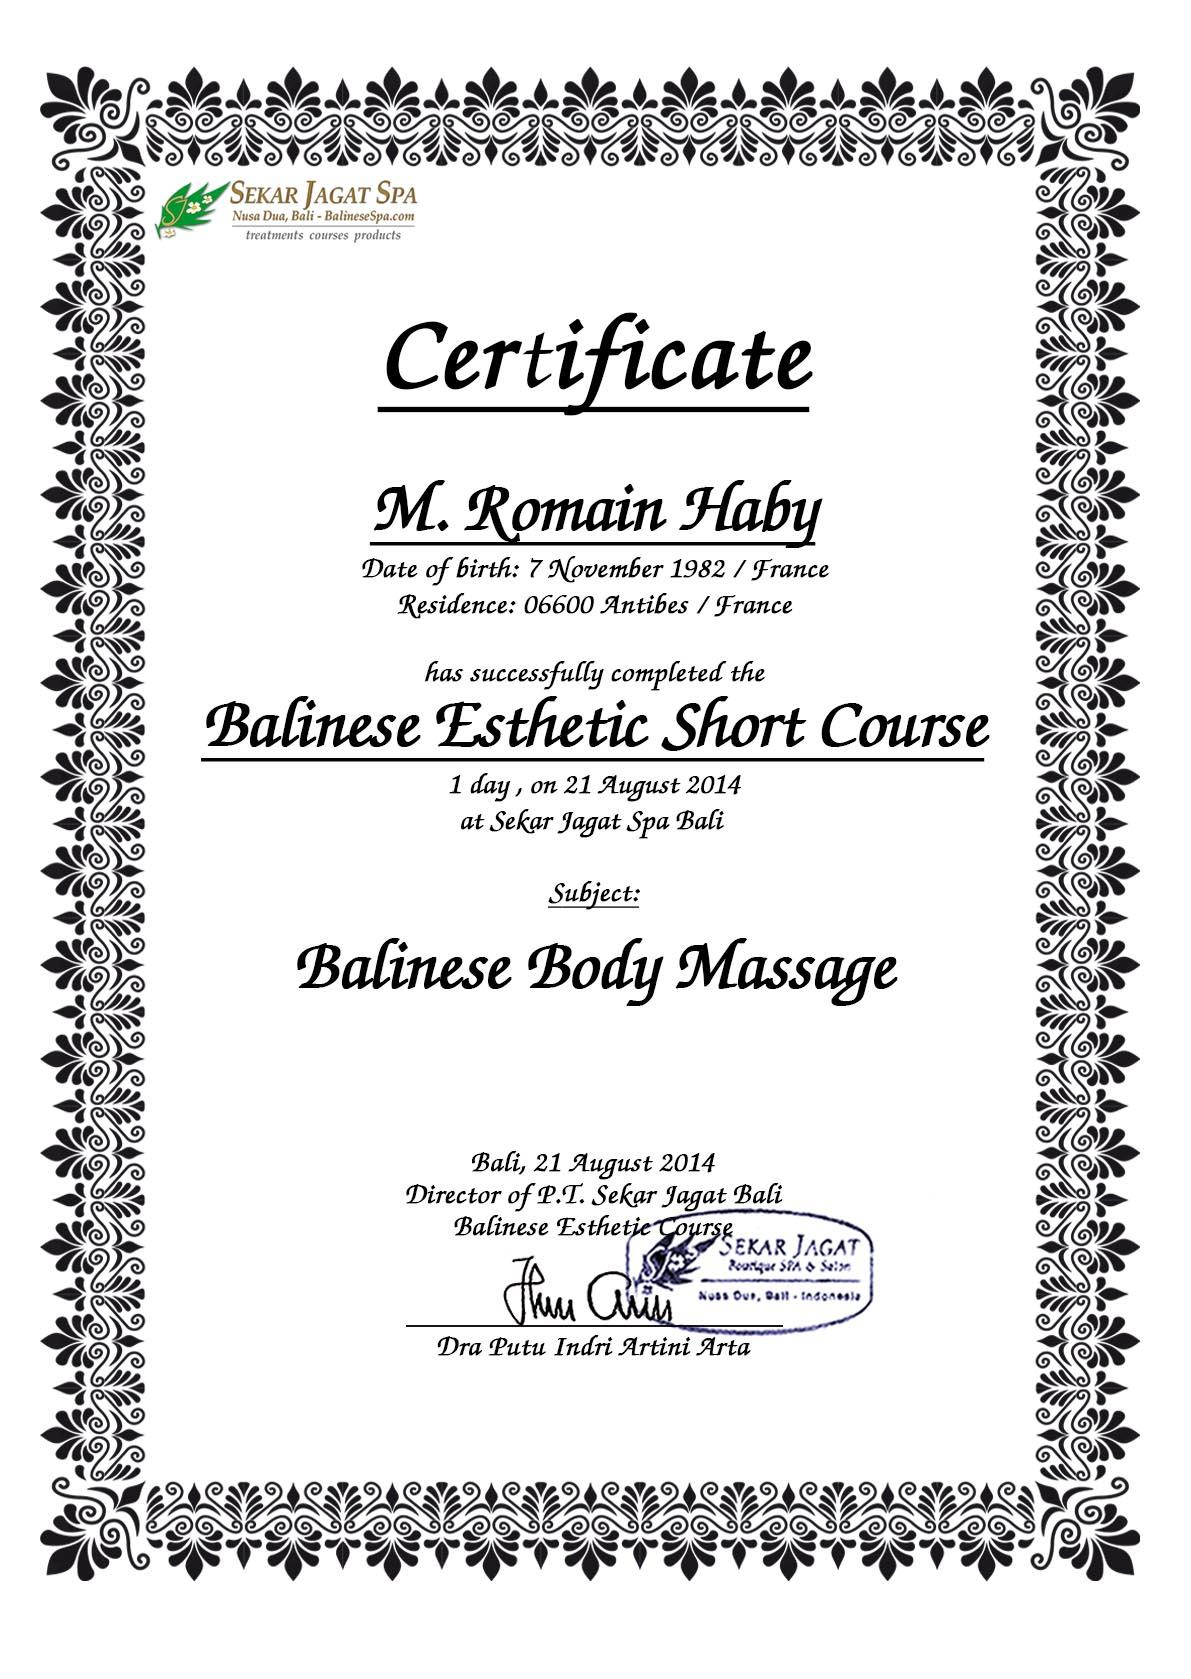 Certificate_Romain_Haby.jpg